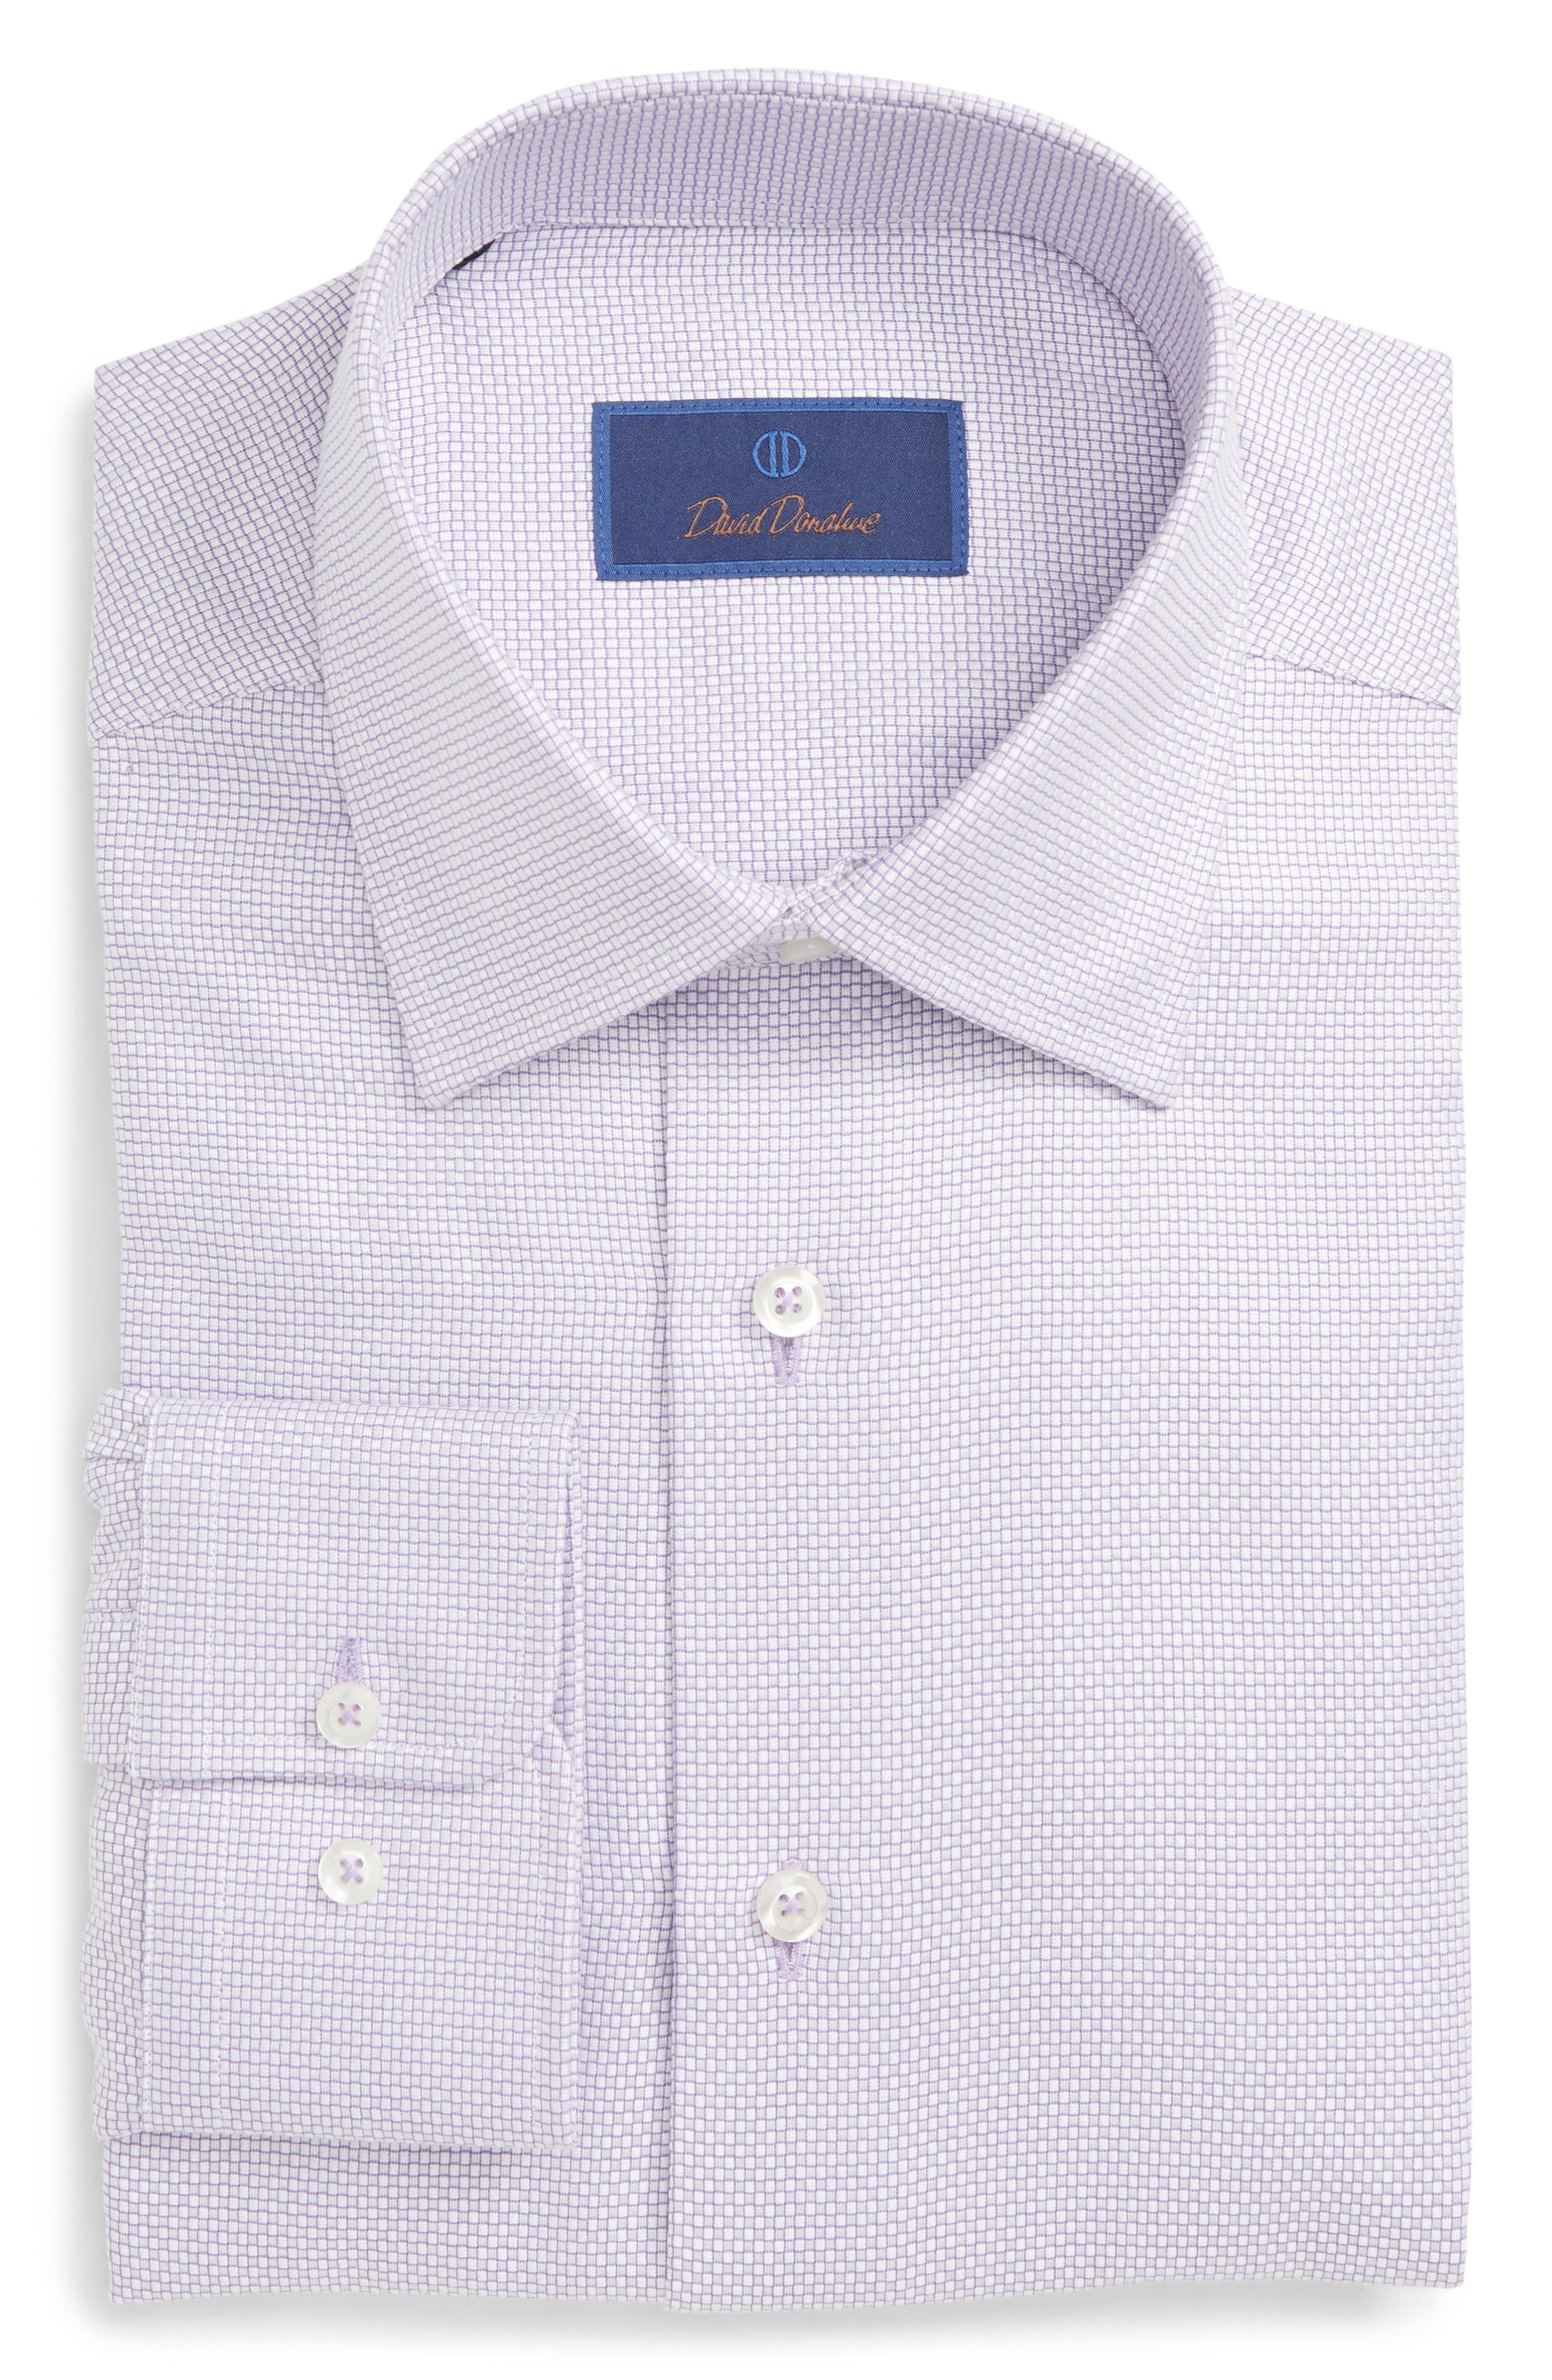 Regular Fit Check Dress Shirt,                         Main,                         color, LILAC